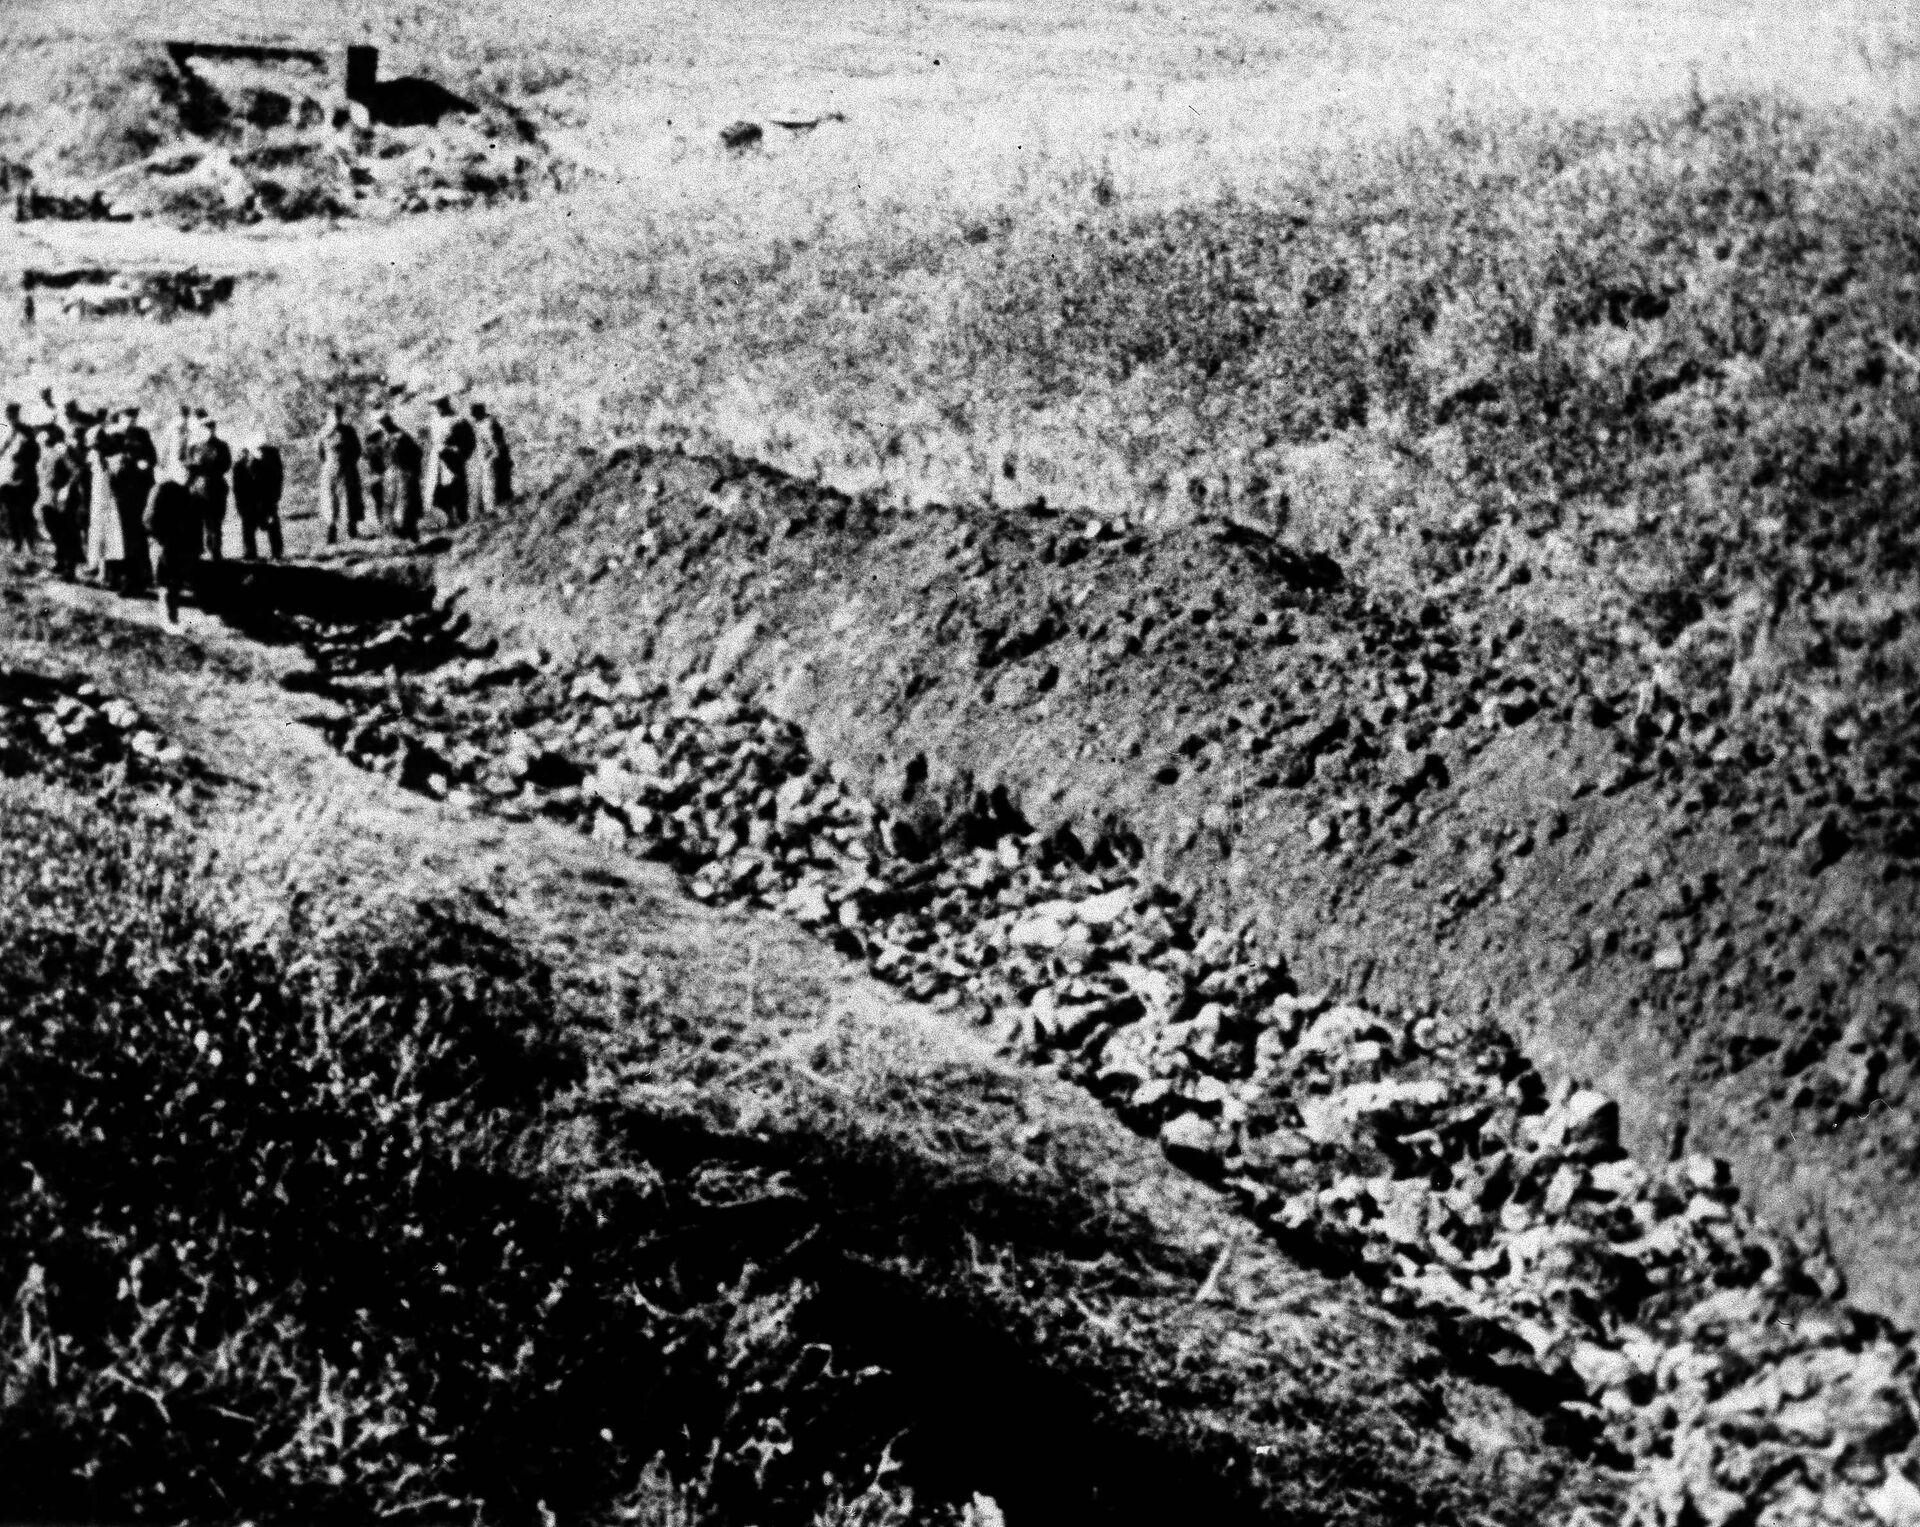 Бабий Яр. 1944 год  - РИА Новости, 1920, 10.03.2021